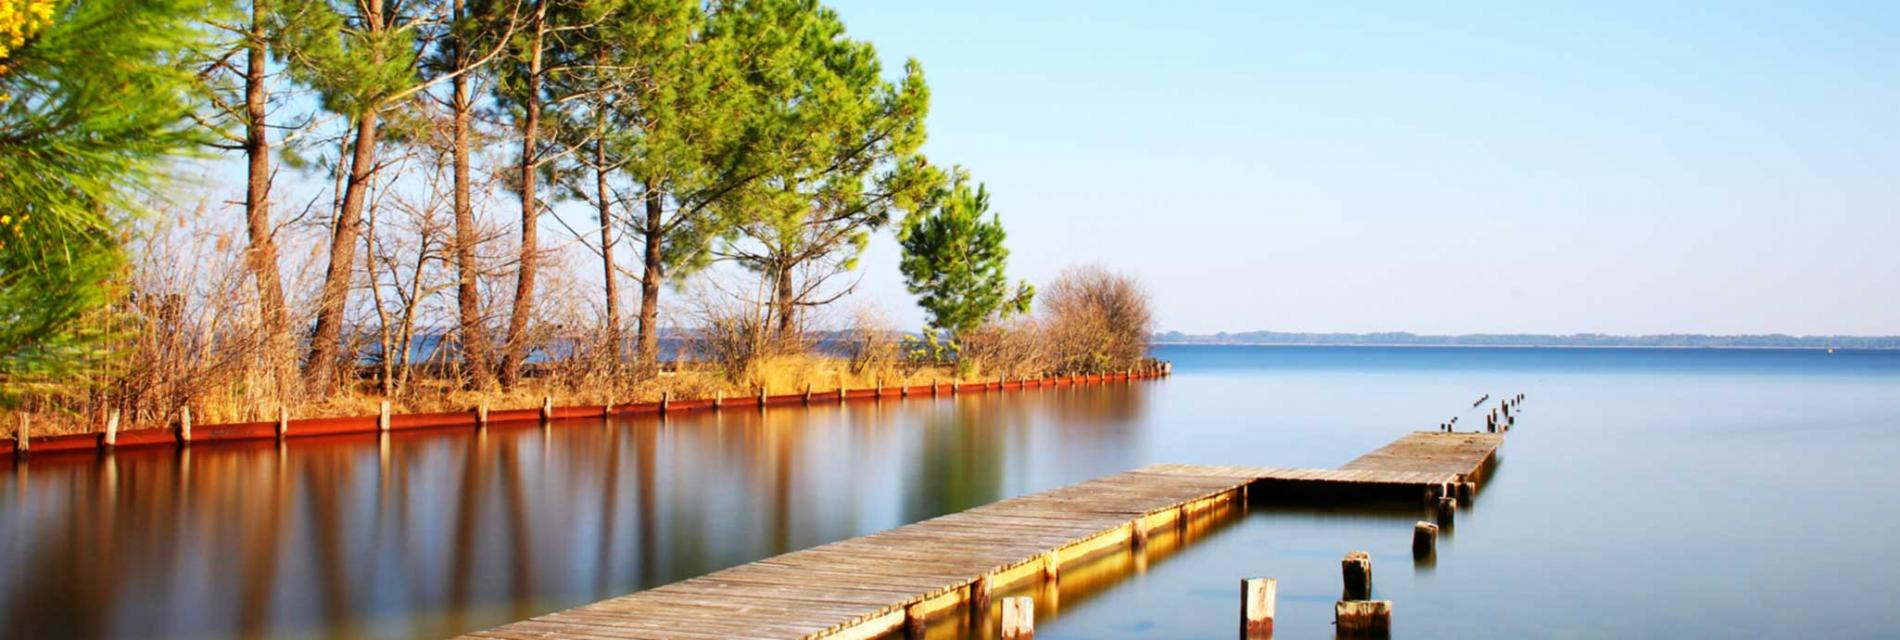 Slide le lac de biscarosse